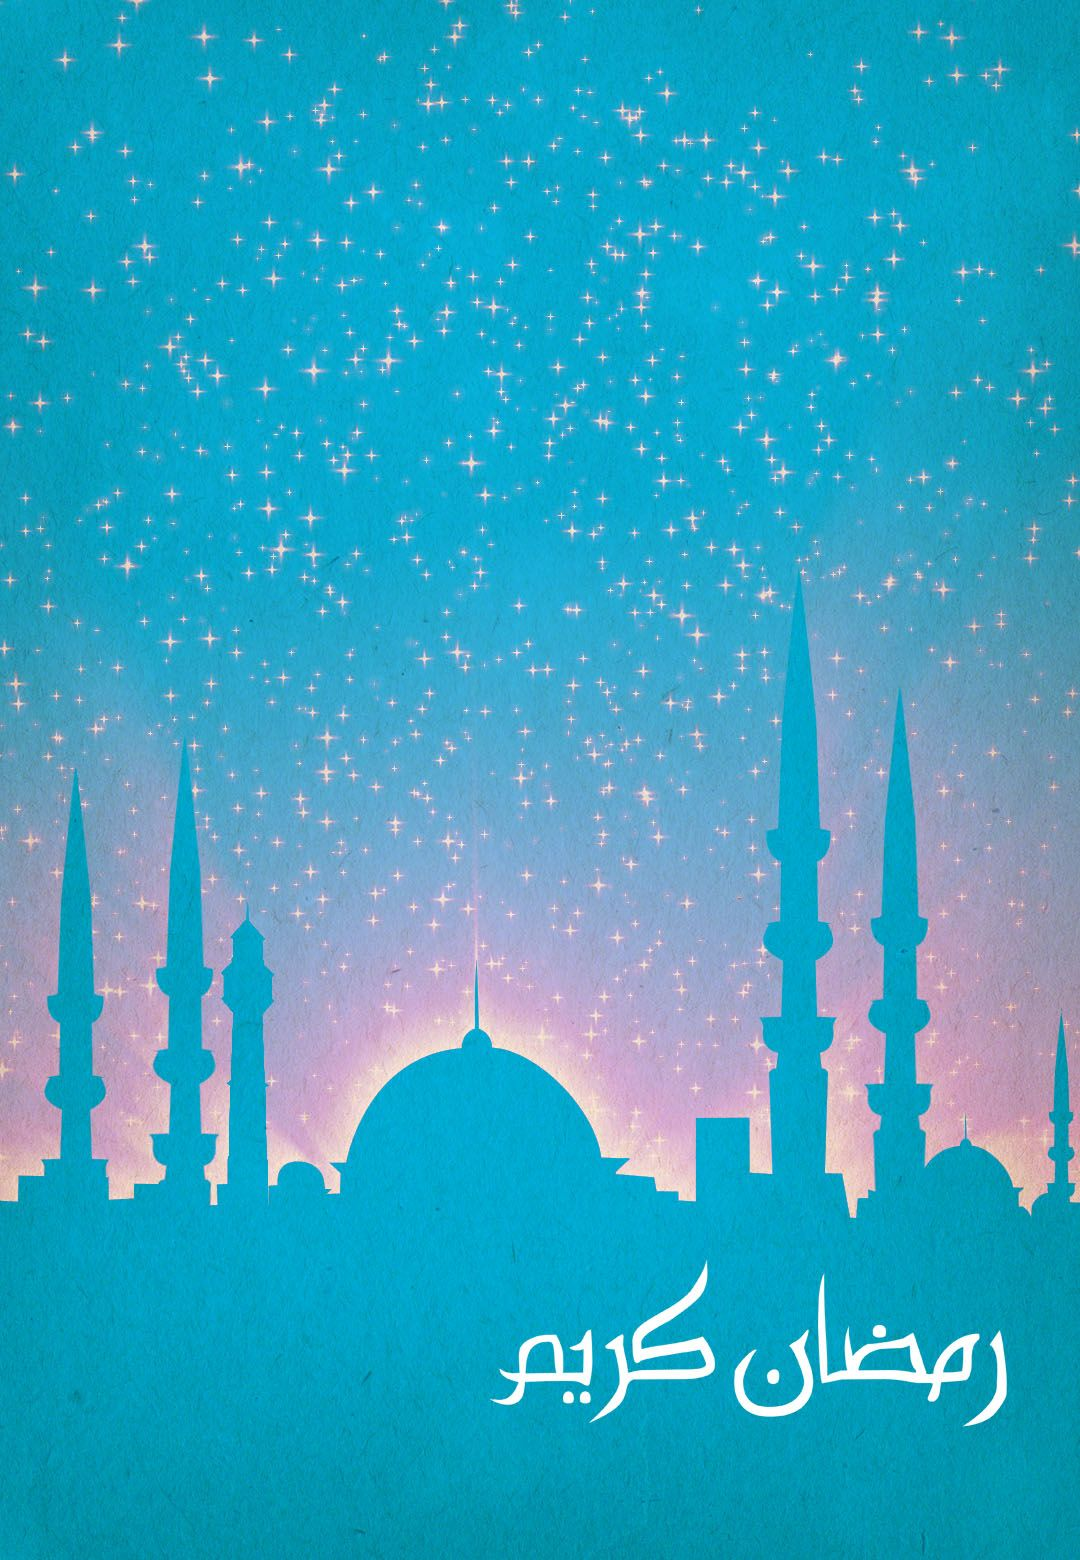 Background Abstrak Islami : background, abstrak, islami, Printable, Ramadan, Mosque, Greetings, Island, Islami,, Abstrak,, Kaligrafi